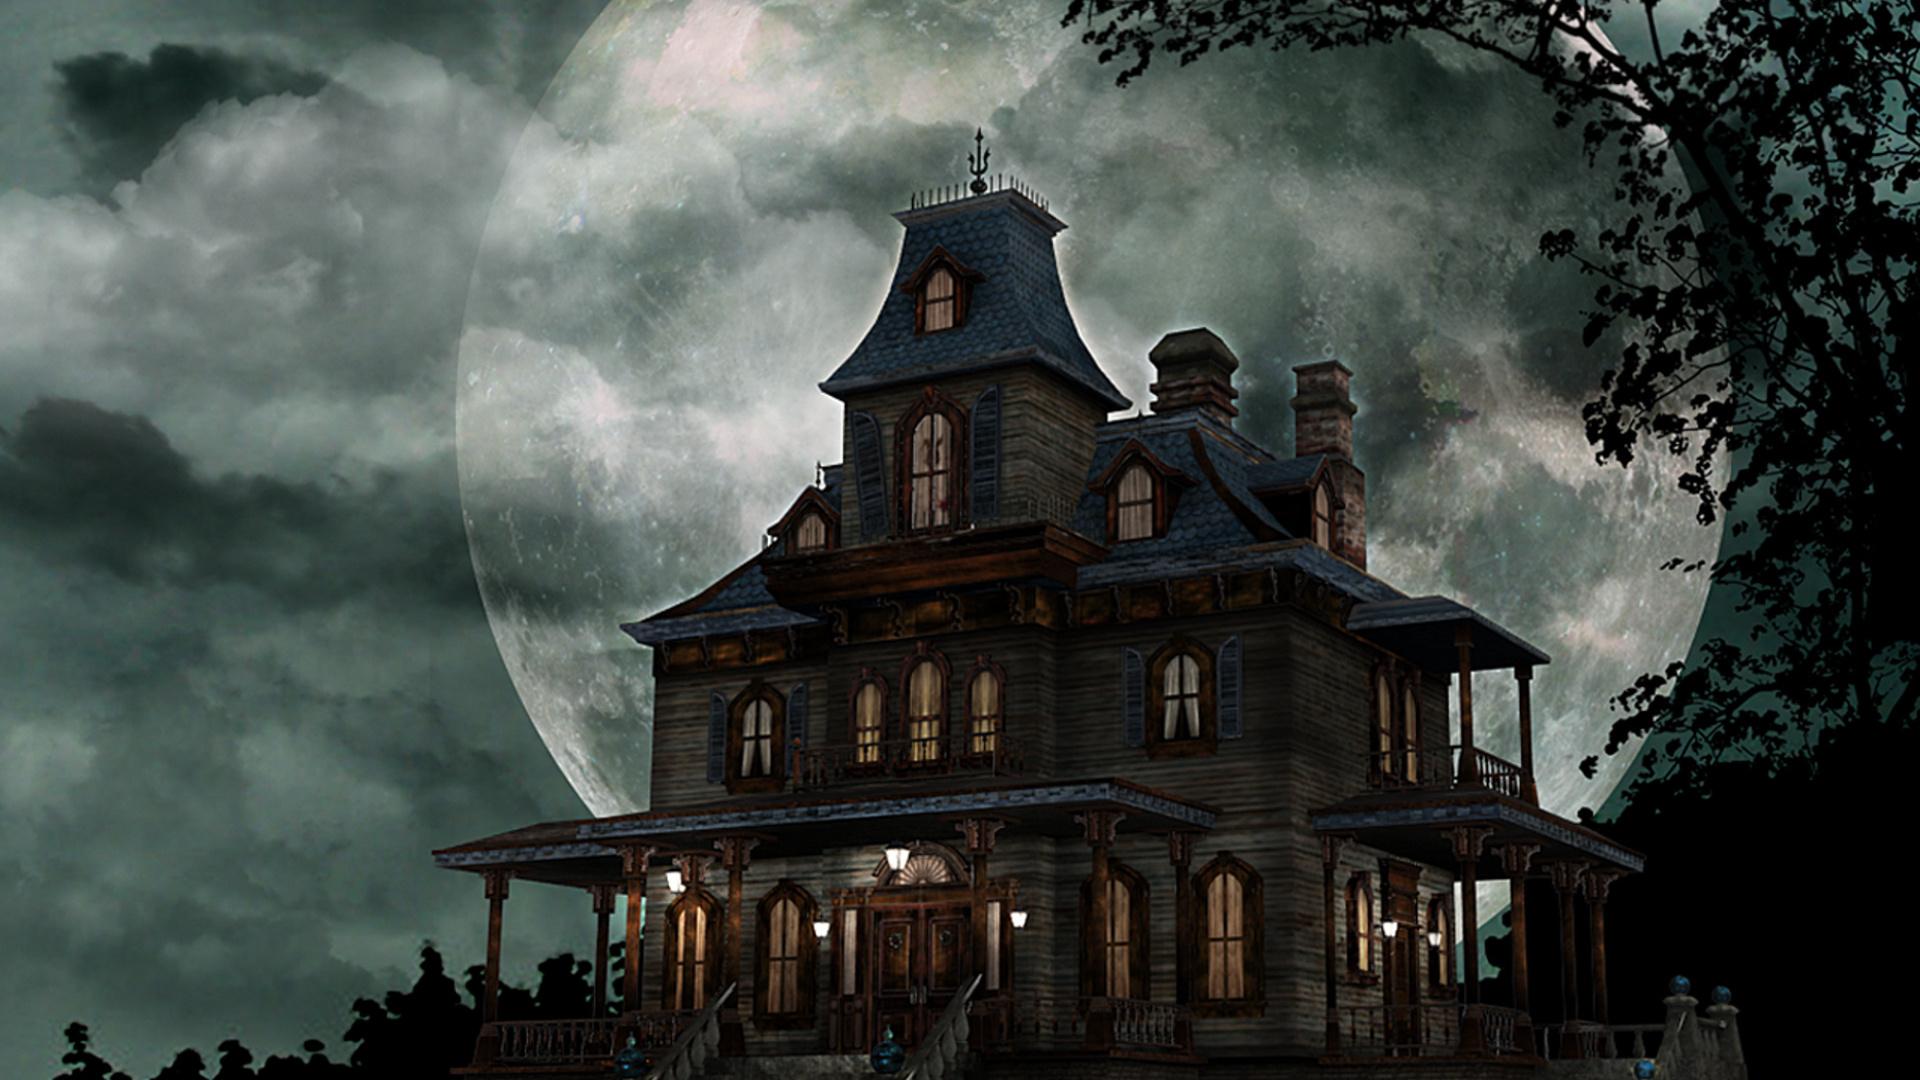 ночь, старая усадьба, фонари, луна, призраки